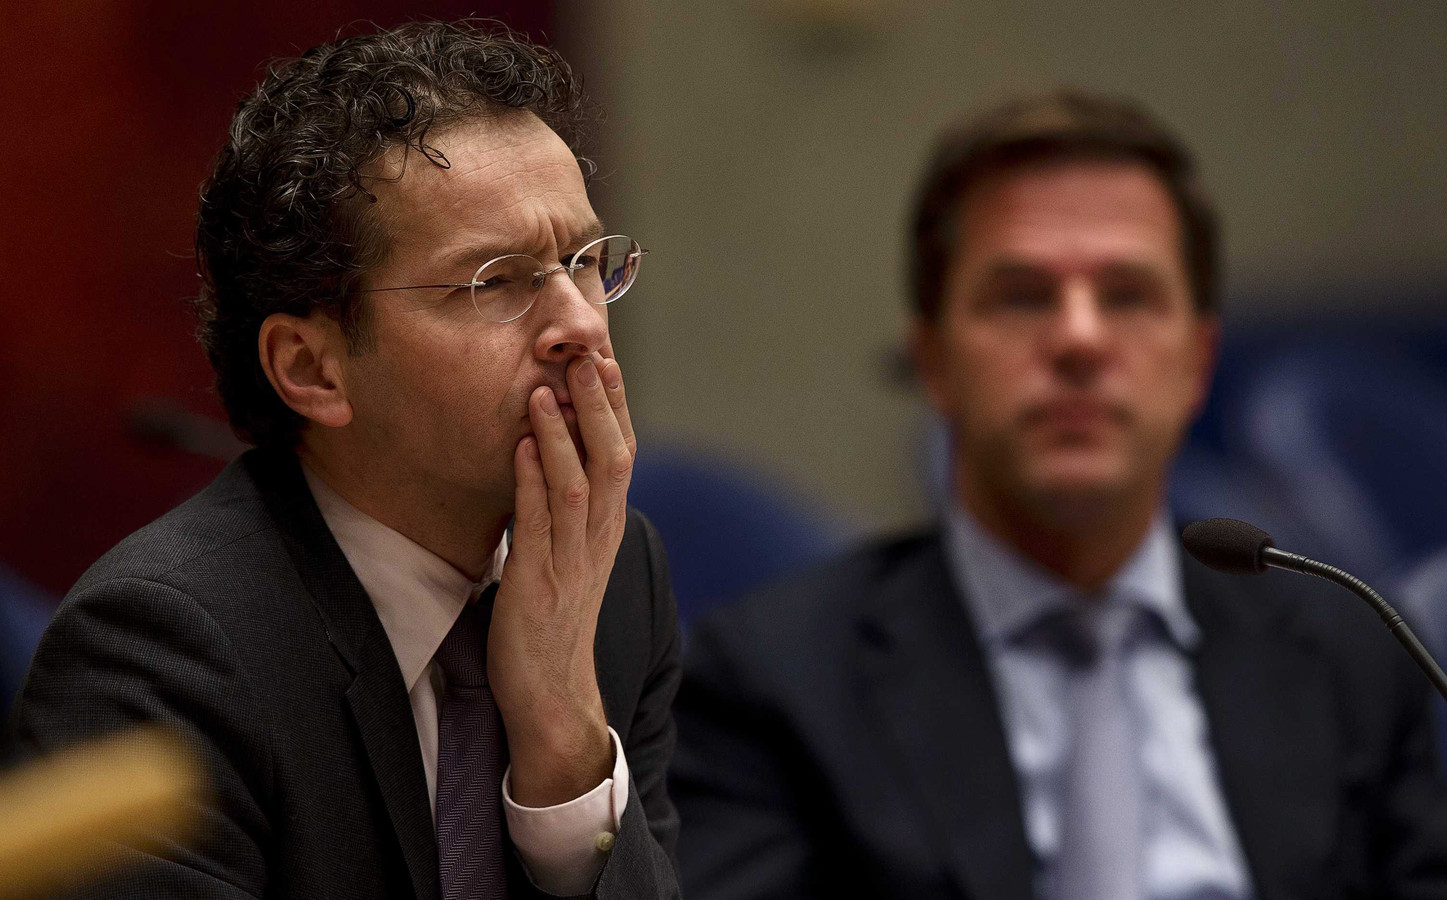 Minister van Financiën Jeroen Dijsselbloem en premier Mark Rutte